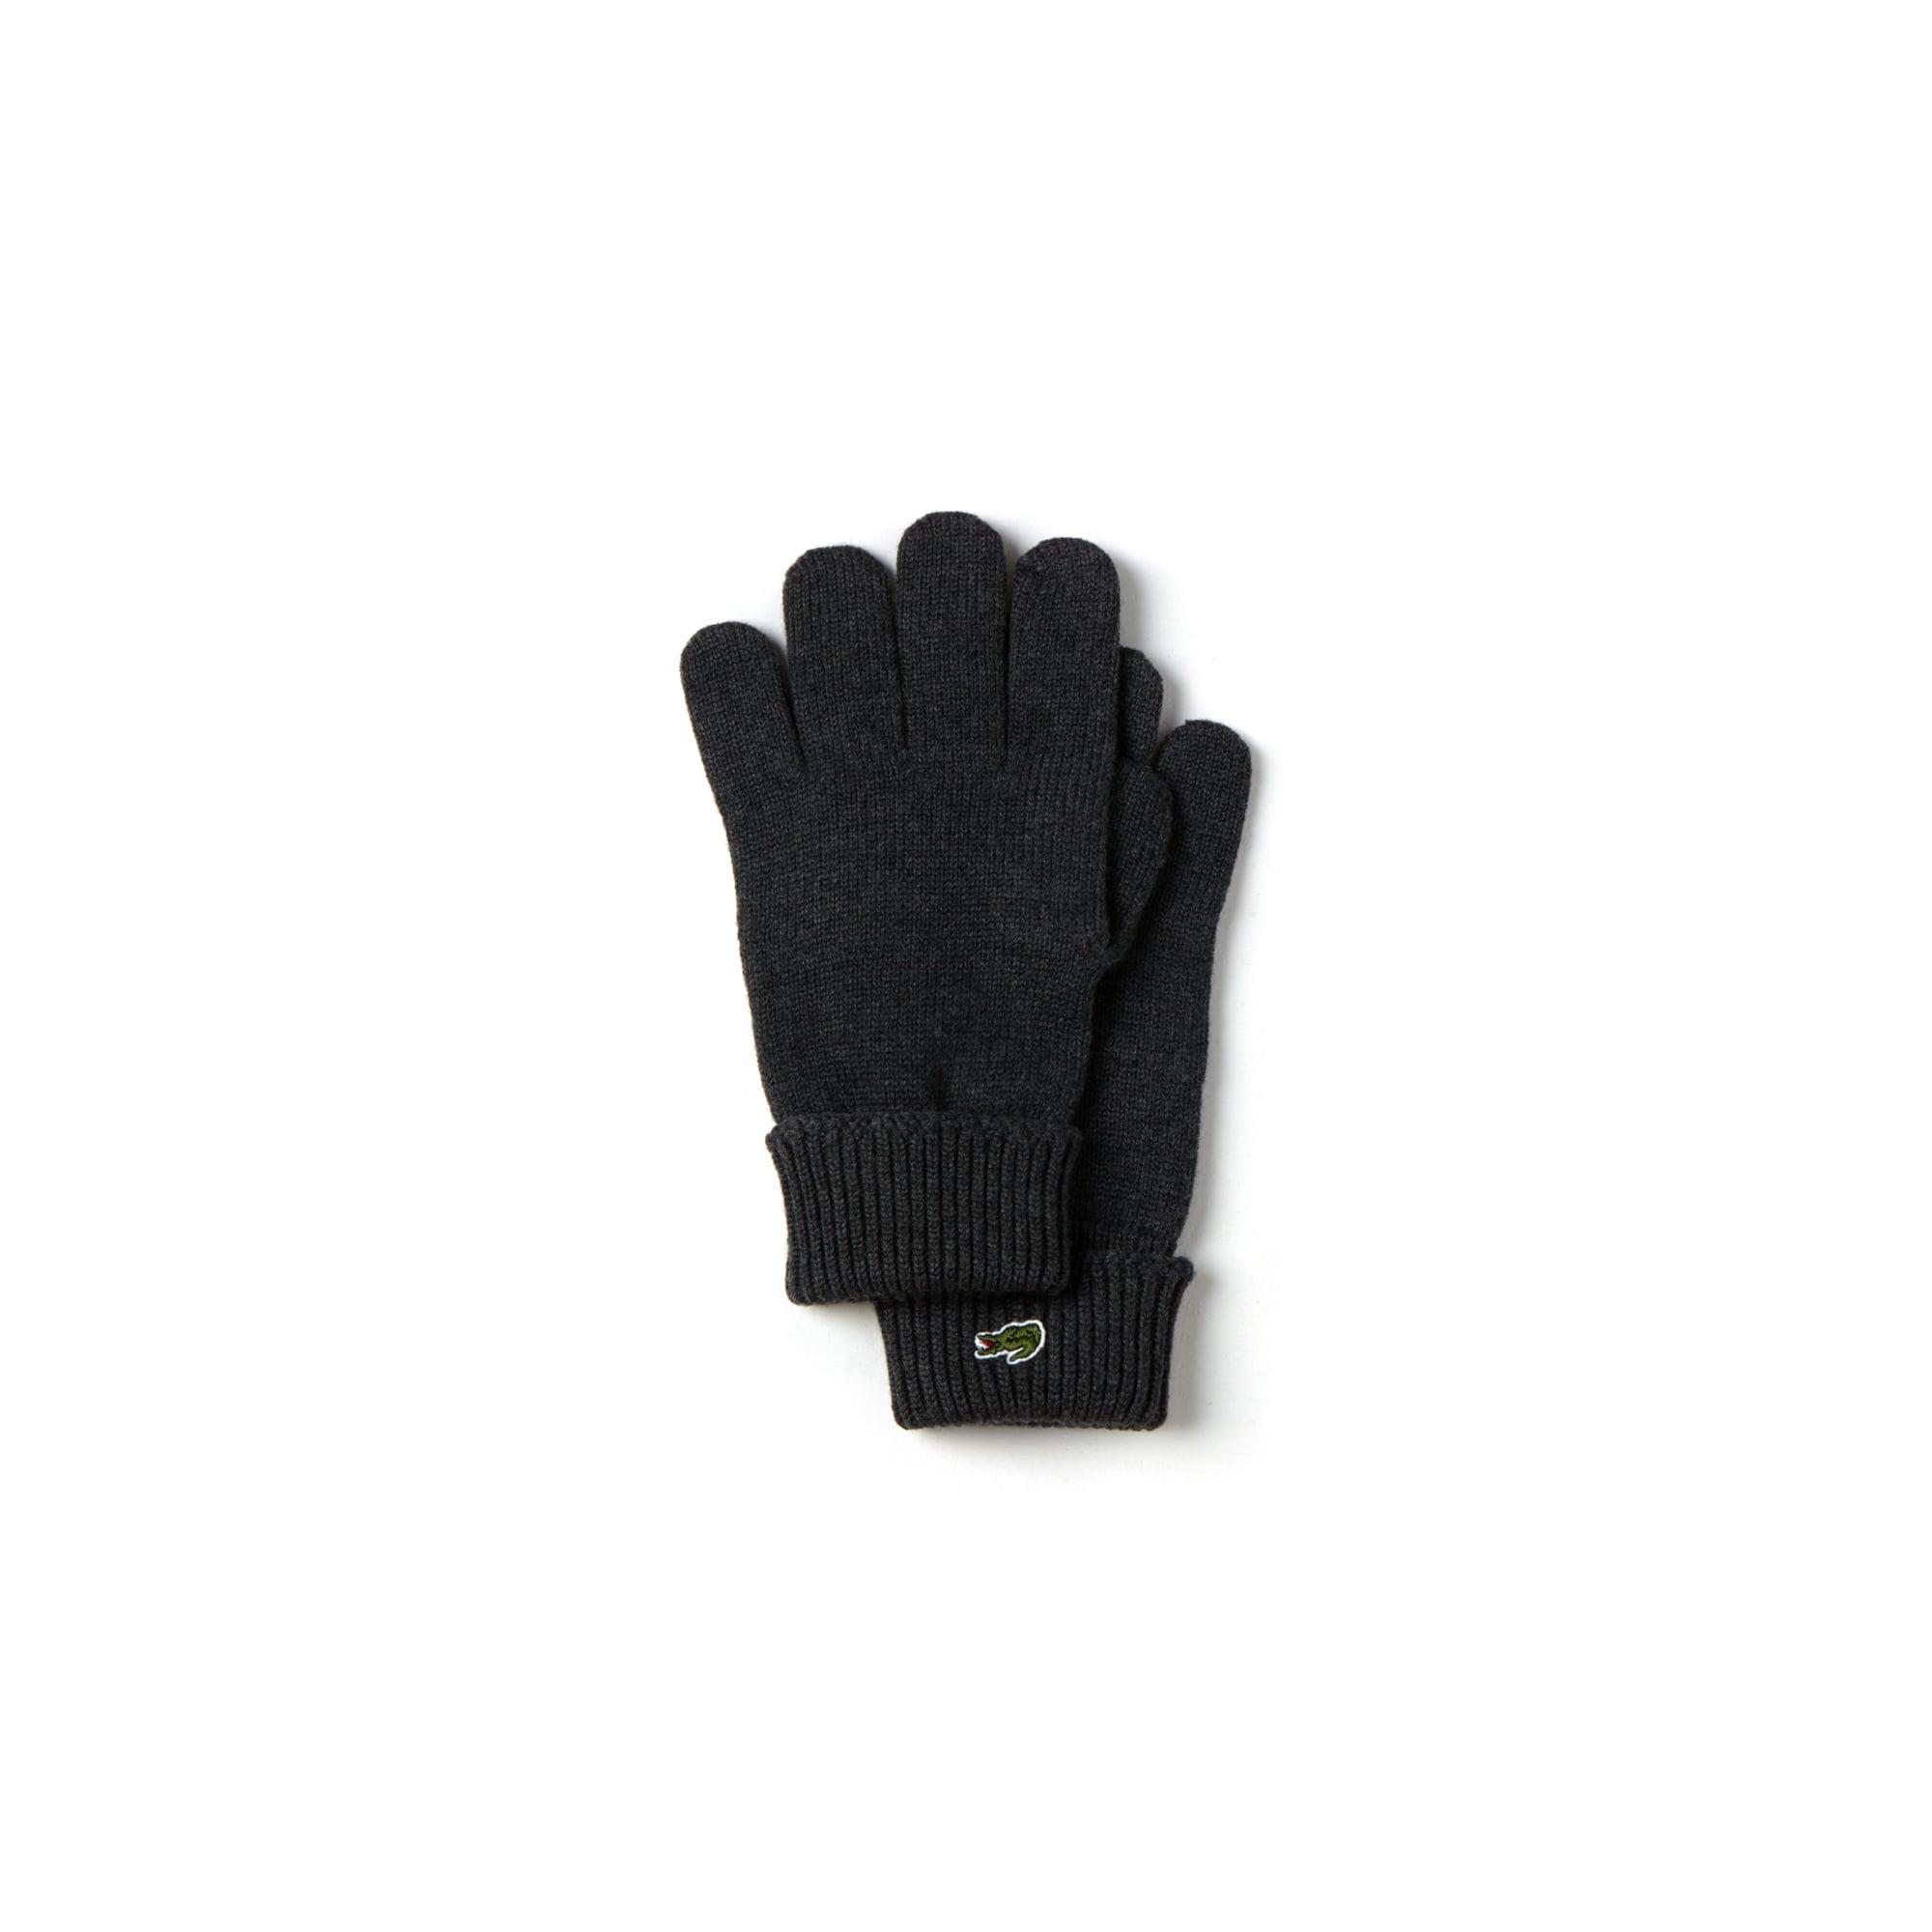 0d681d6c282590 Men s Ribbed Wool Gloves. Colour   DARK GREY JASPE. Colour   DARK GREY JASPE